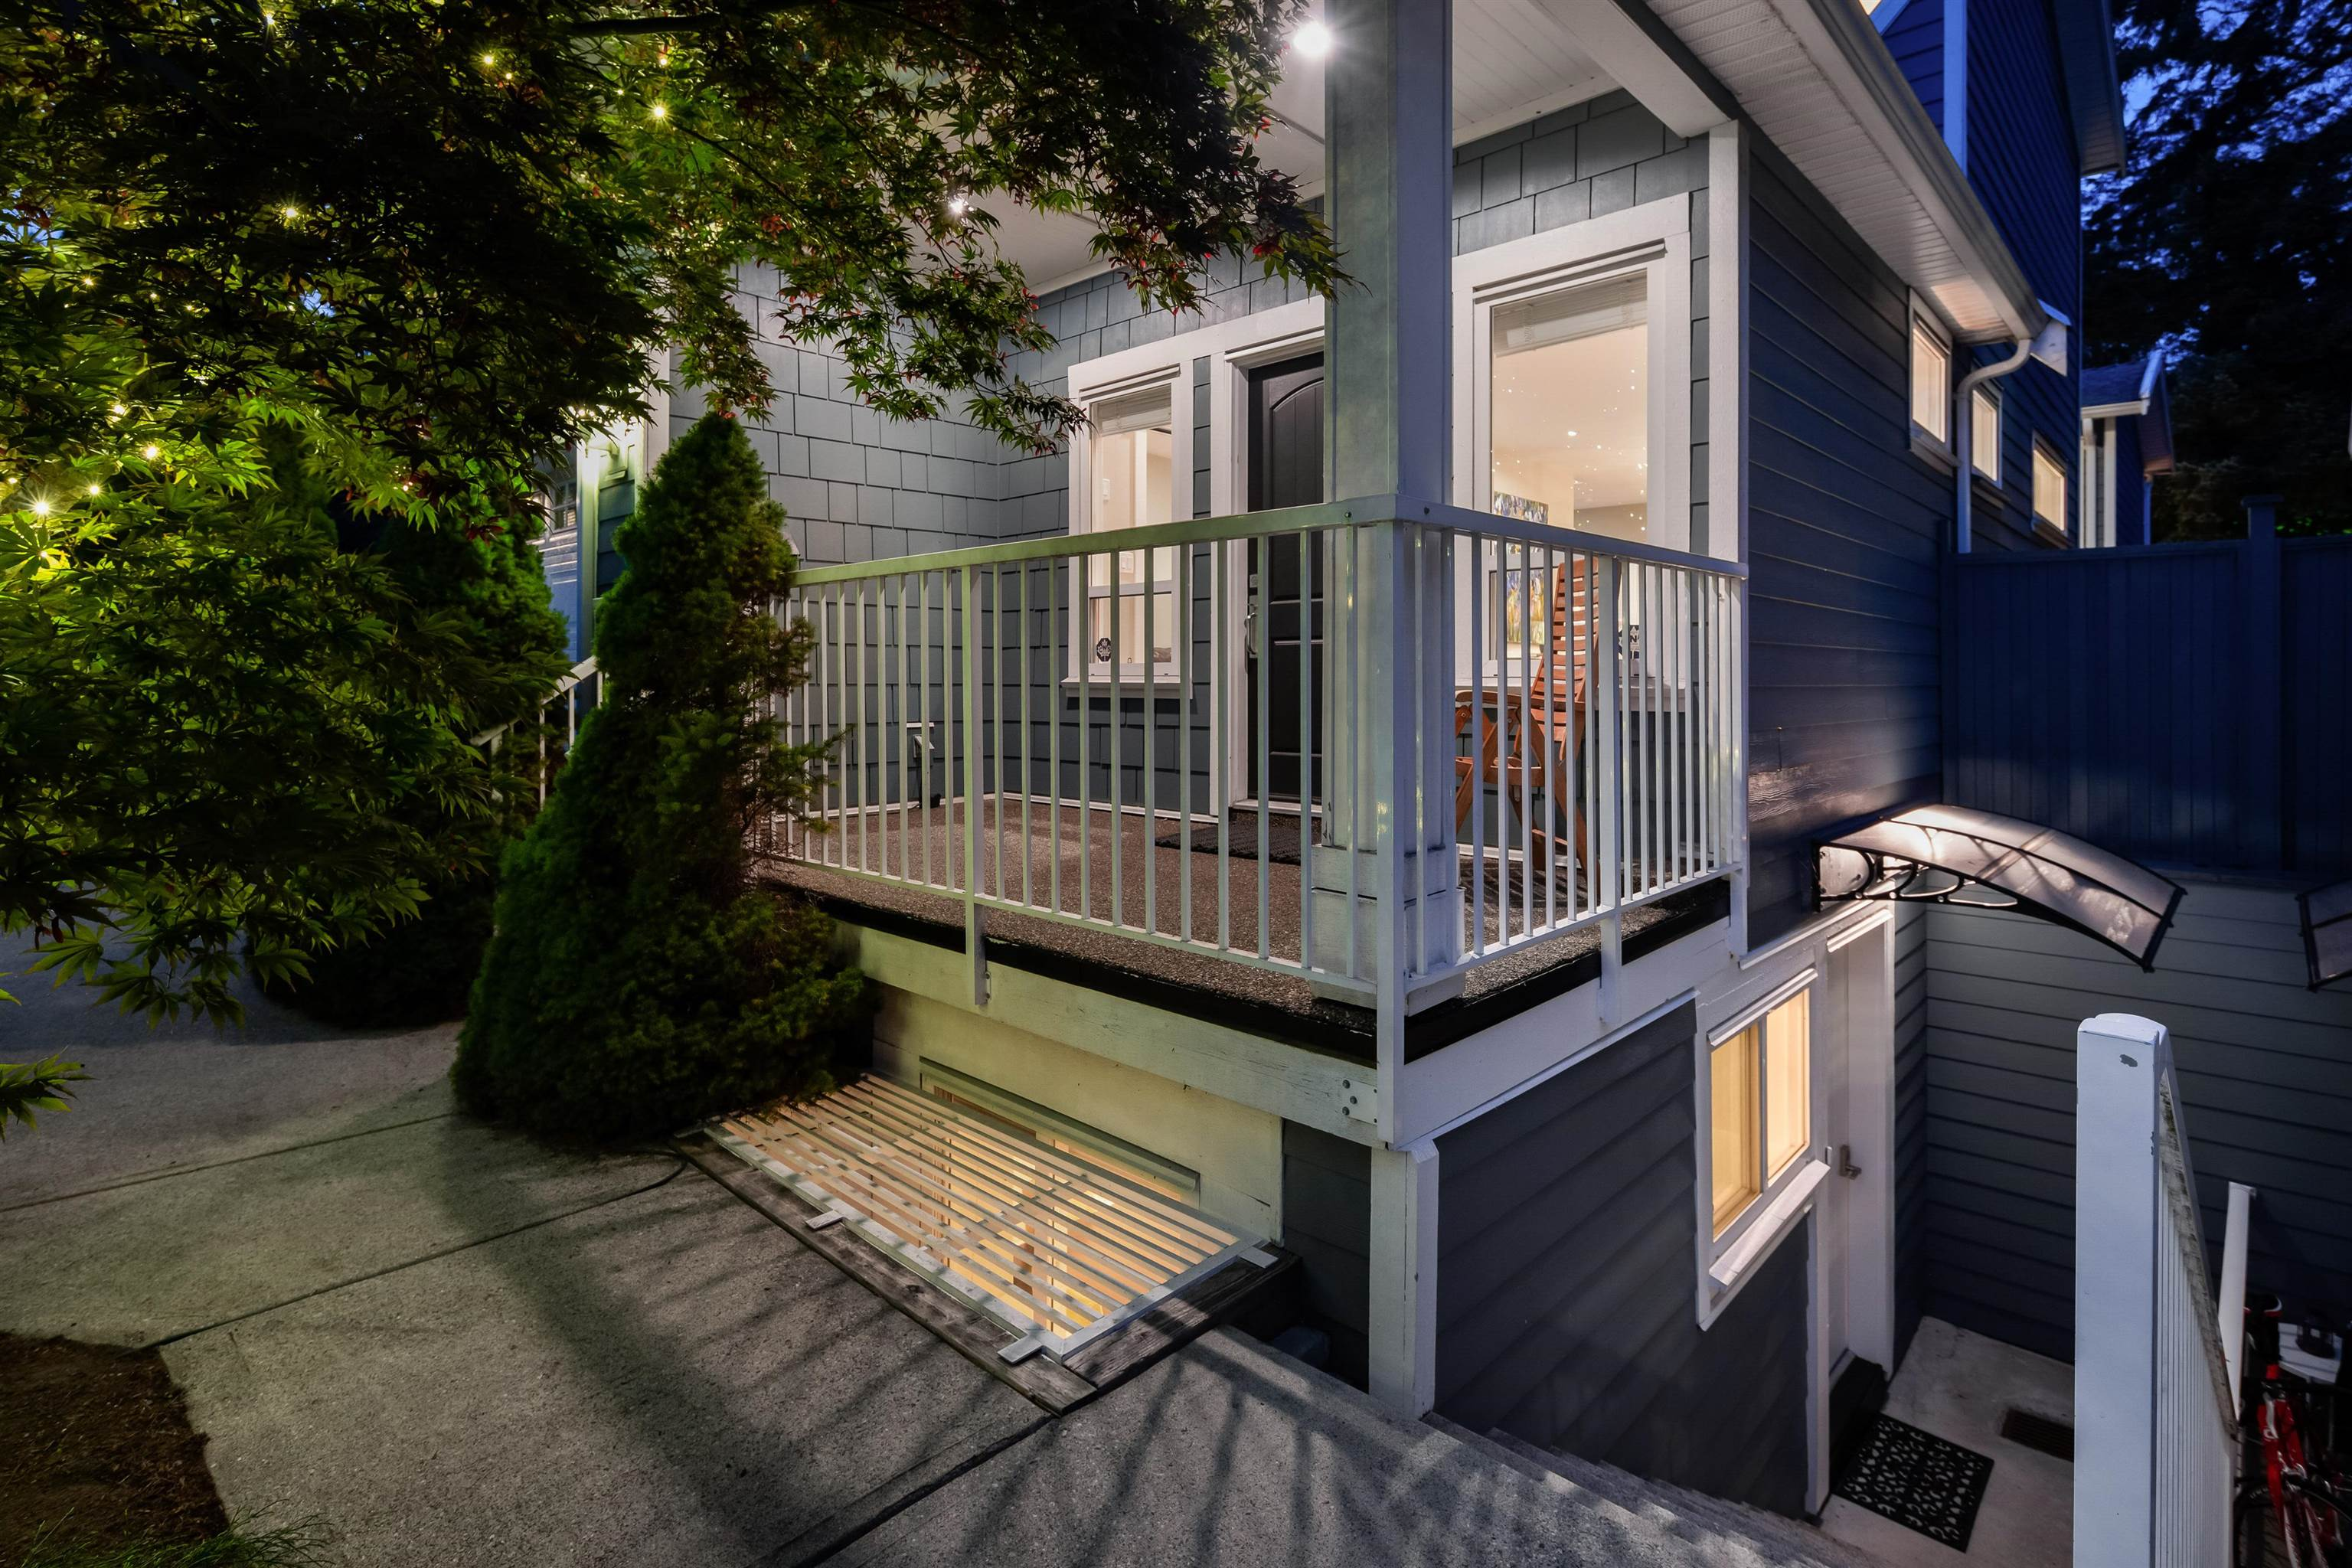 2258 WINDRIDGE DRIVE - Seymour NV House/Single Family for sale, 5 Bedrooms (R2617156) - #39